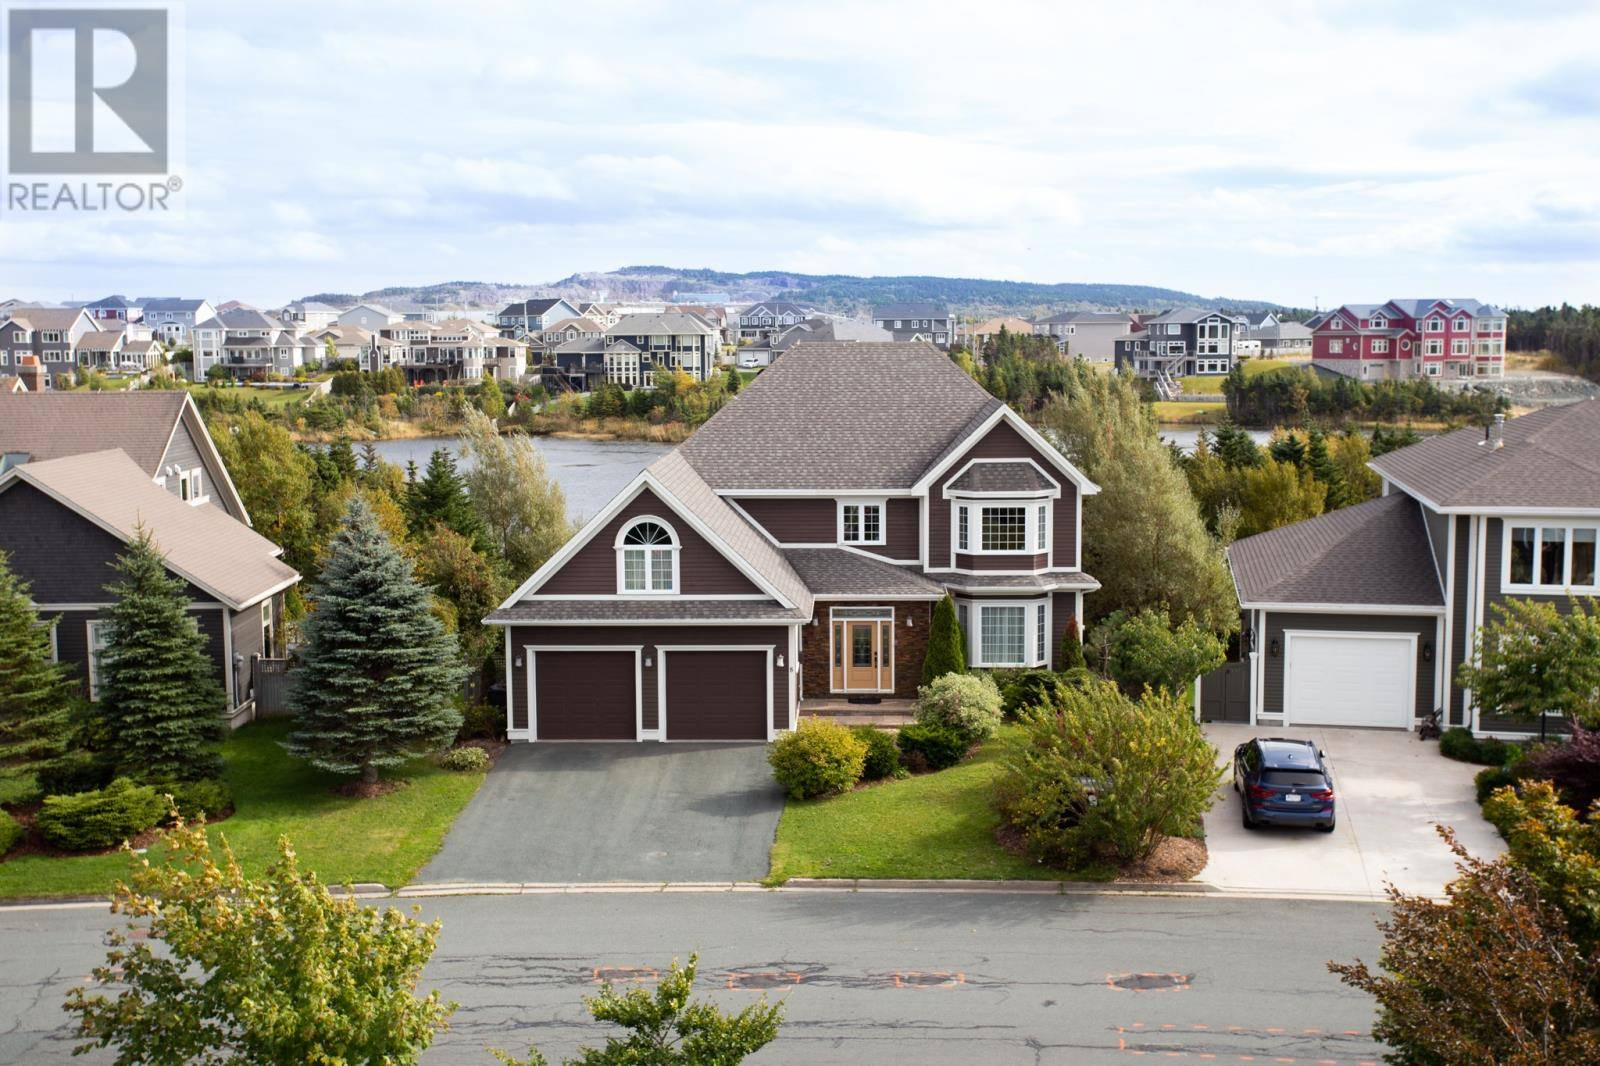 House for sale at 8 Cheyne Dr St. John's Newfoundland - MLS: 1209532